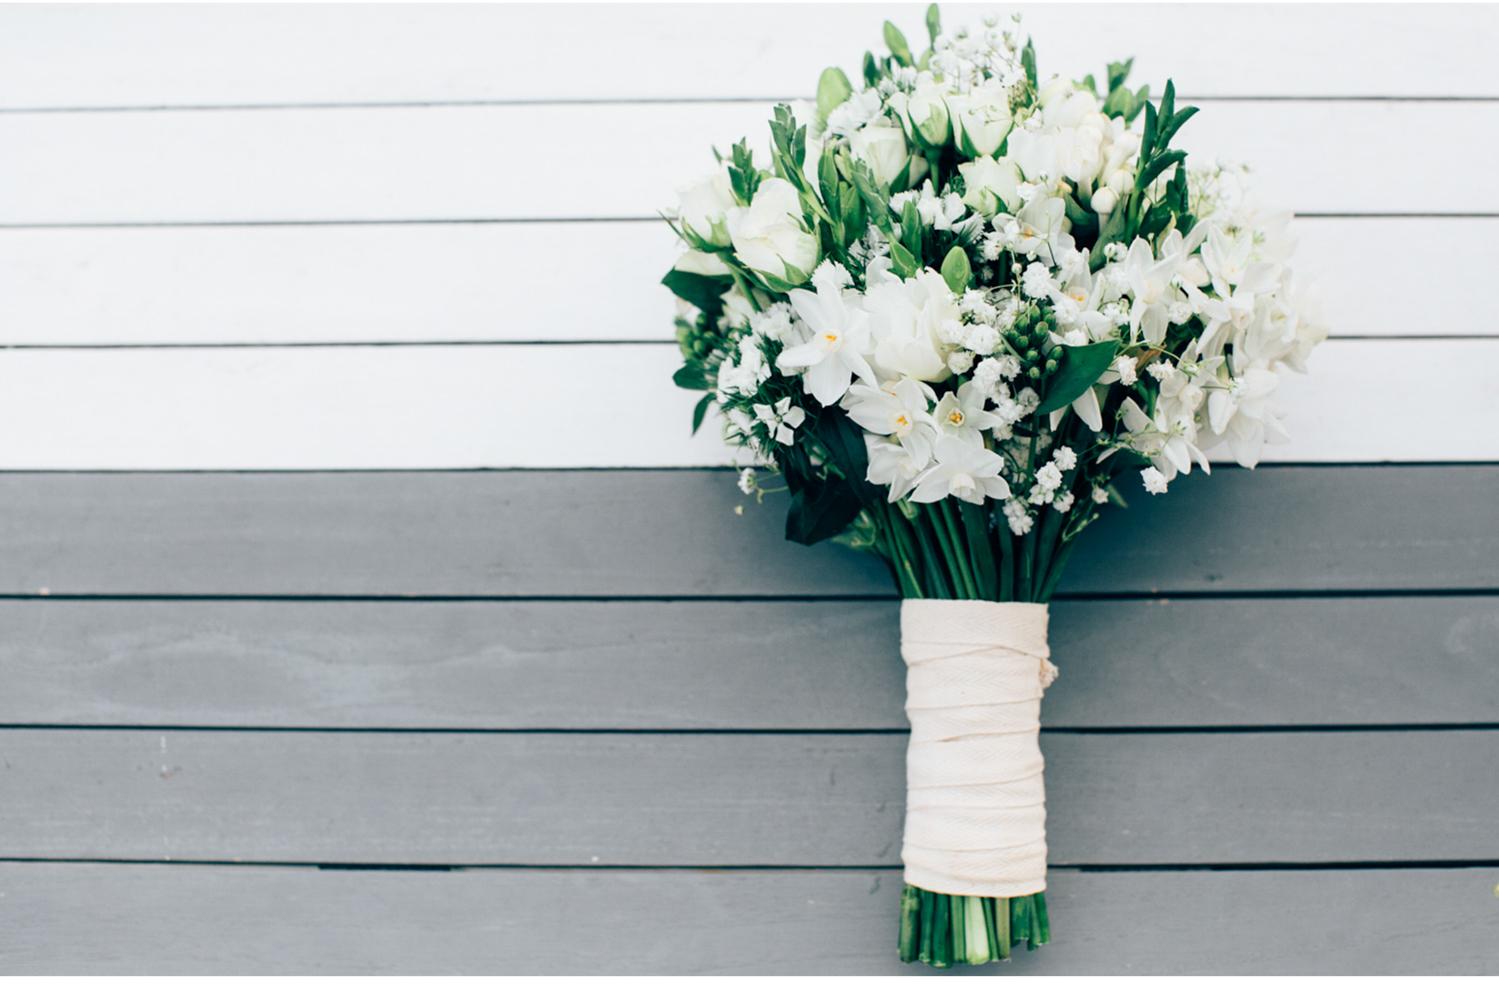 sheridan_nilsson_watsons_bay_wedding.21.jpg